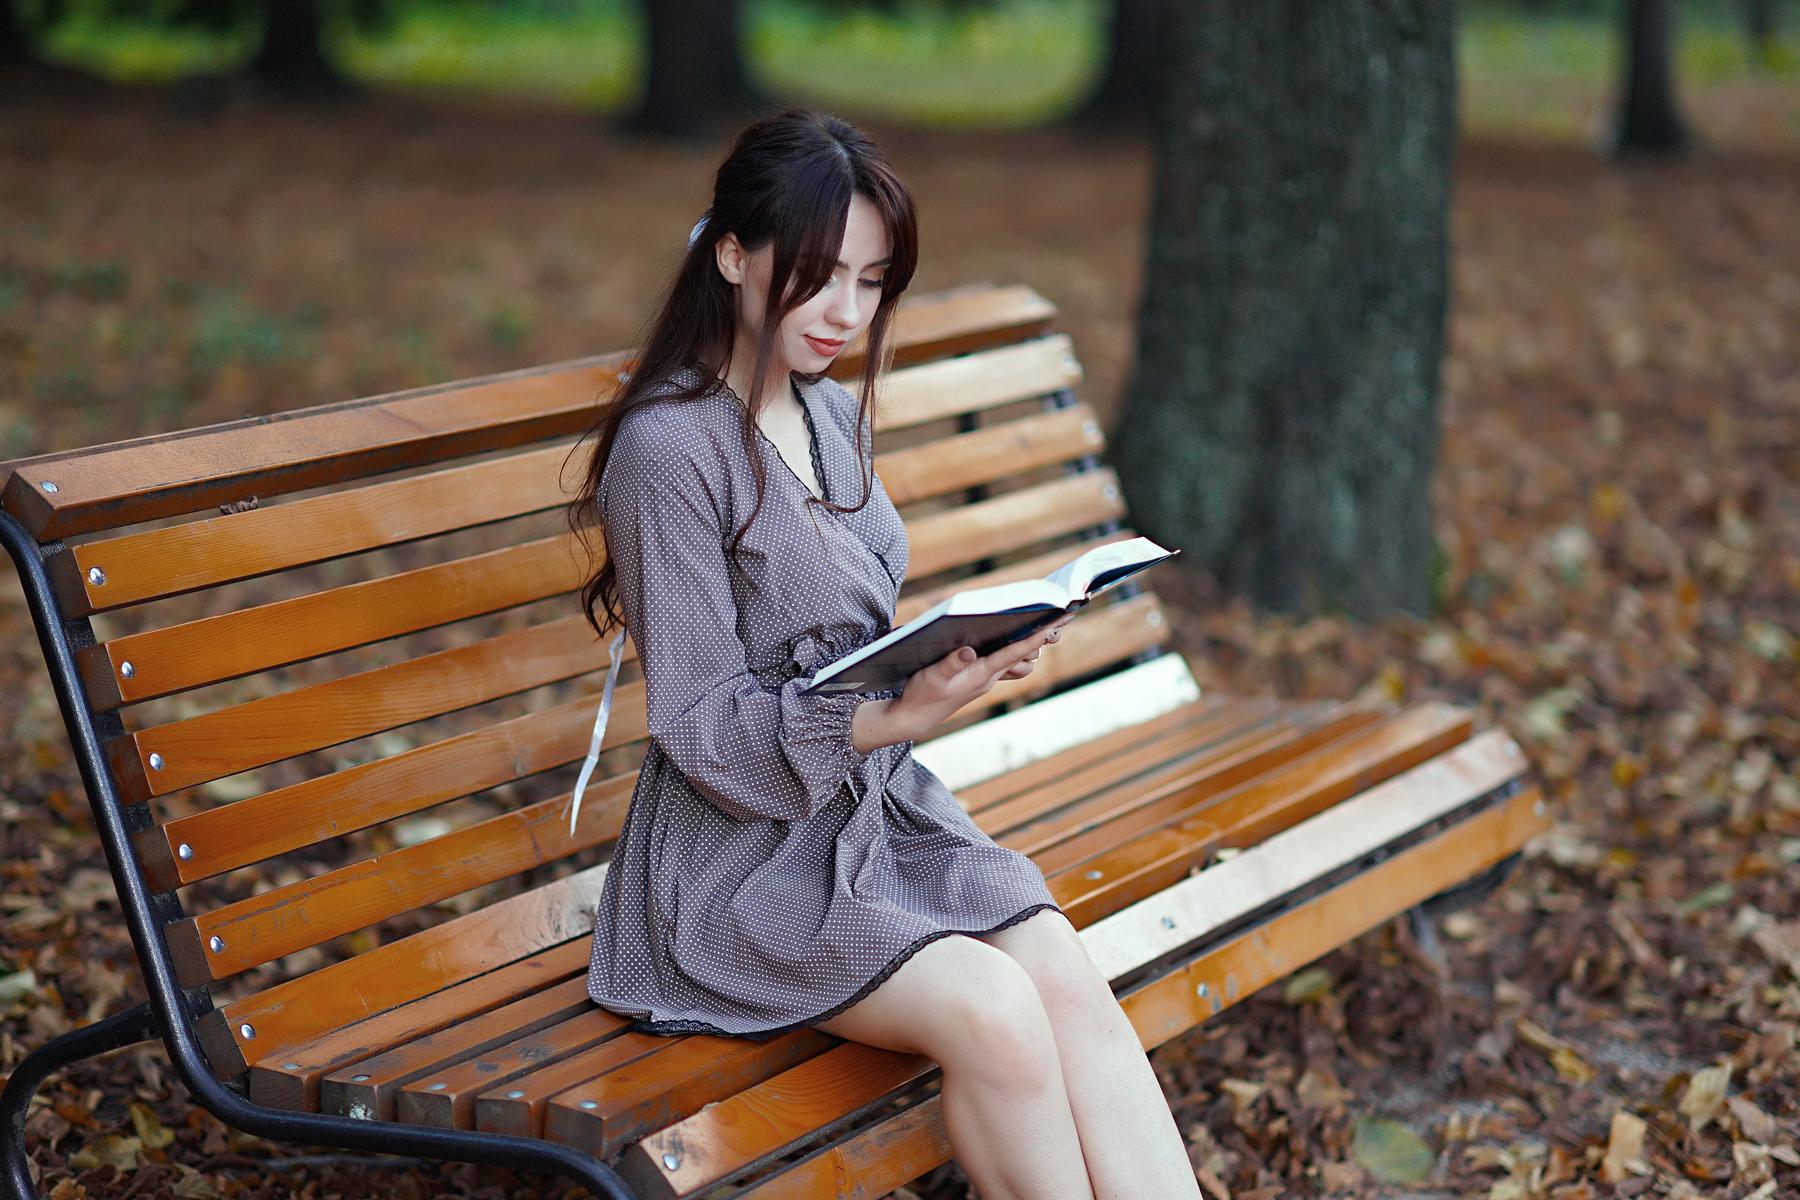 People 1800x1200 women model brunette long hair women outdoors reading bench books fall fallen leaves park minidress legs